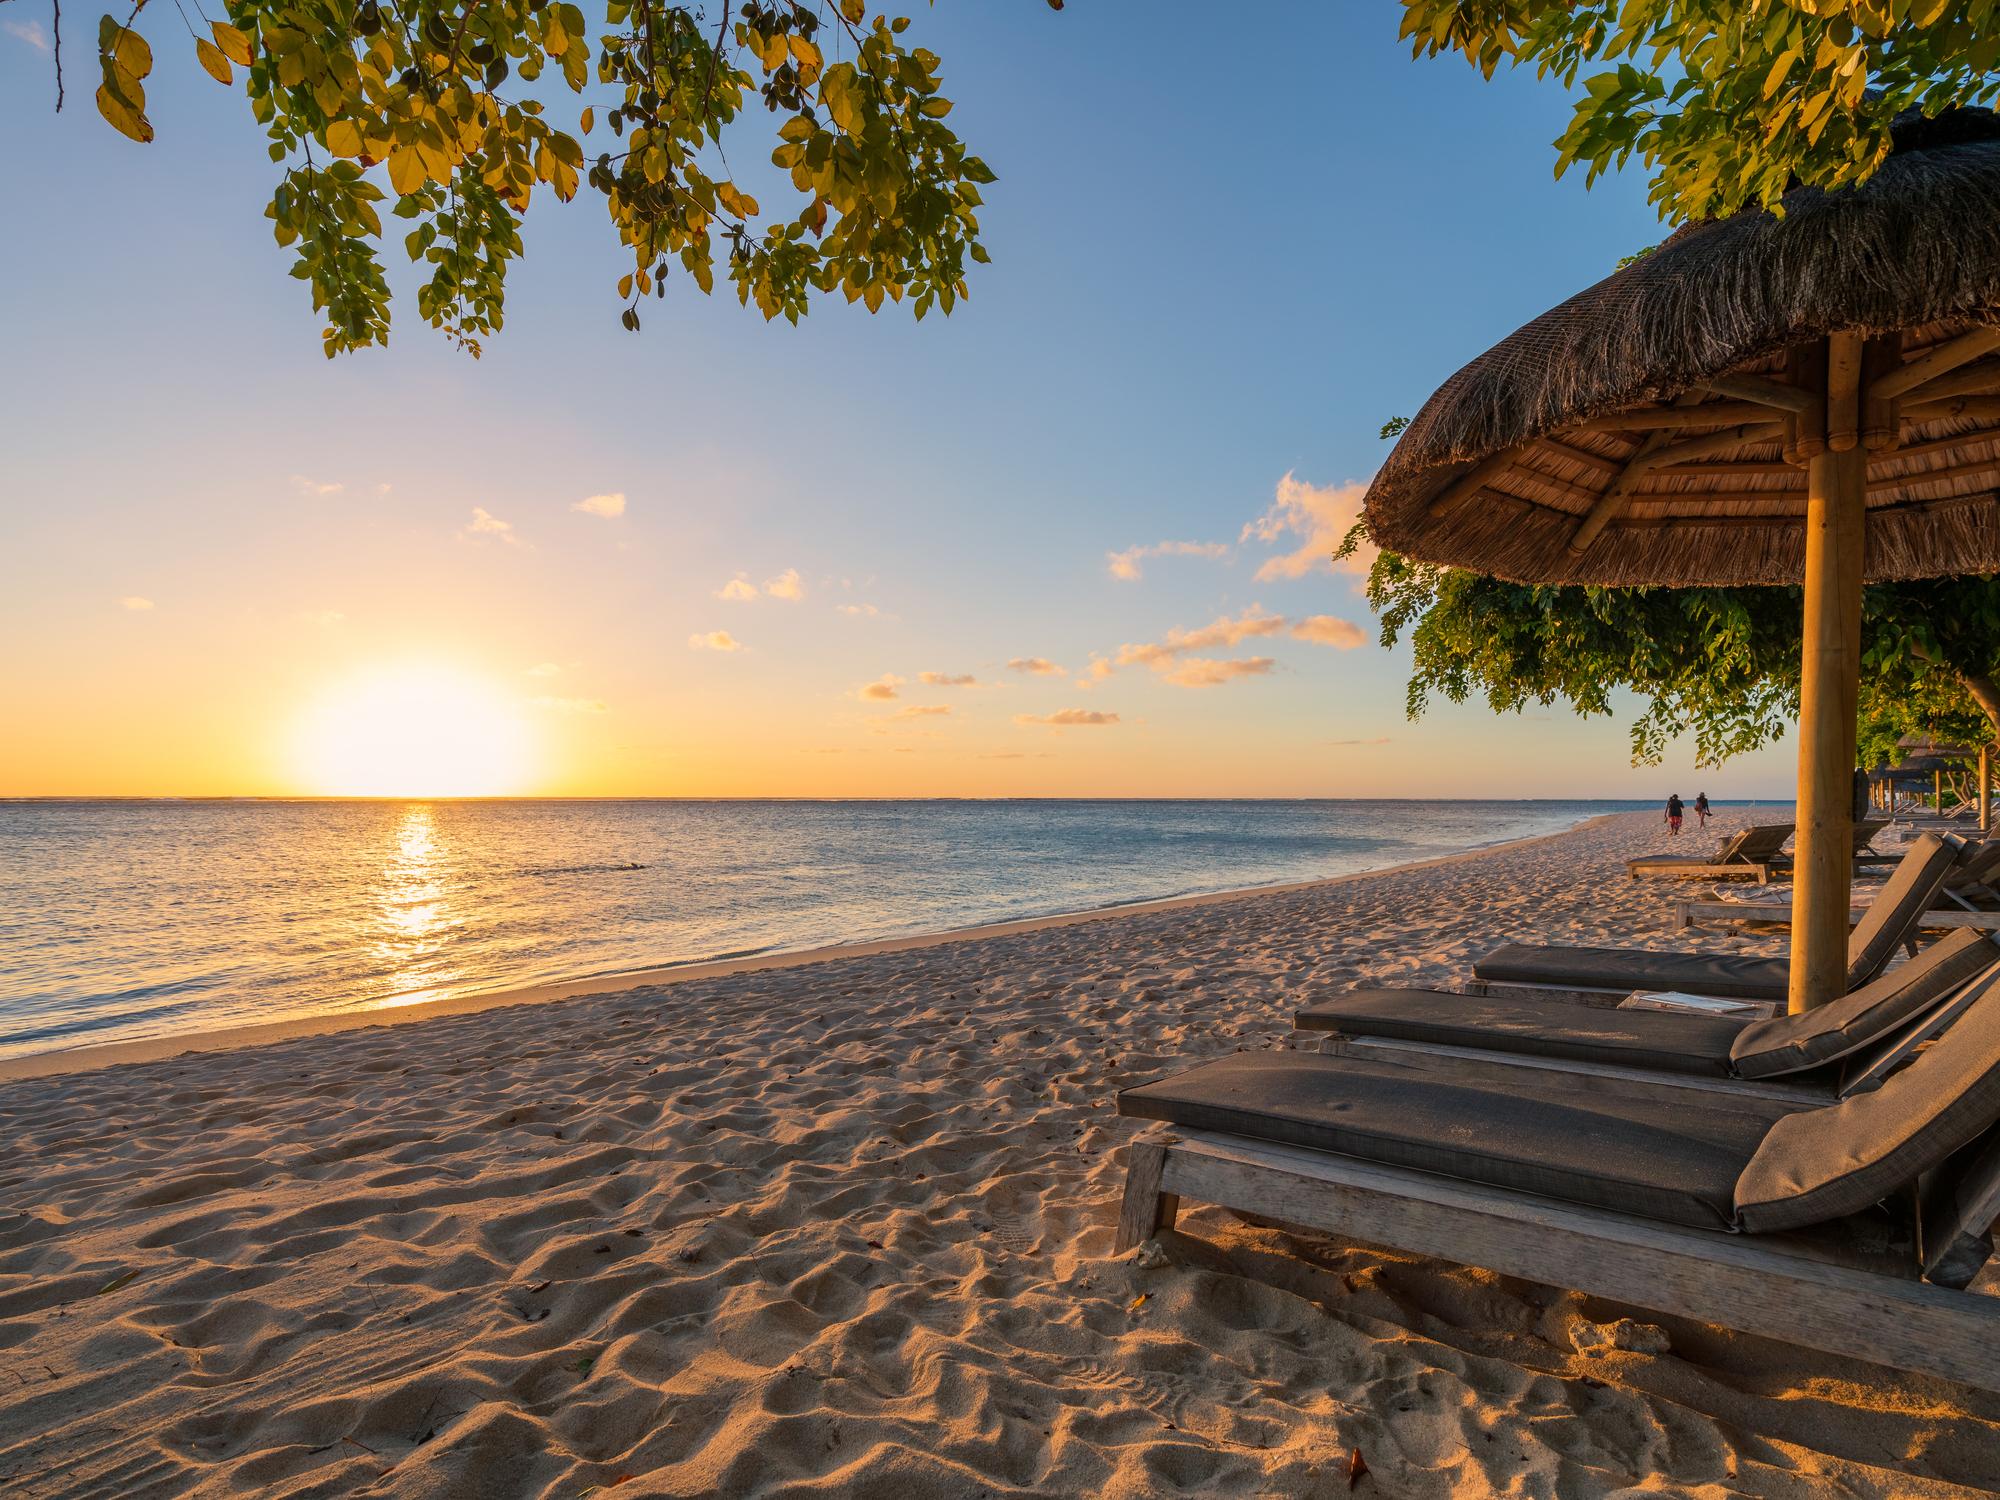 Mauritius premium visa holders eligible for free Covid-19 vaccination